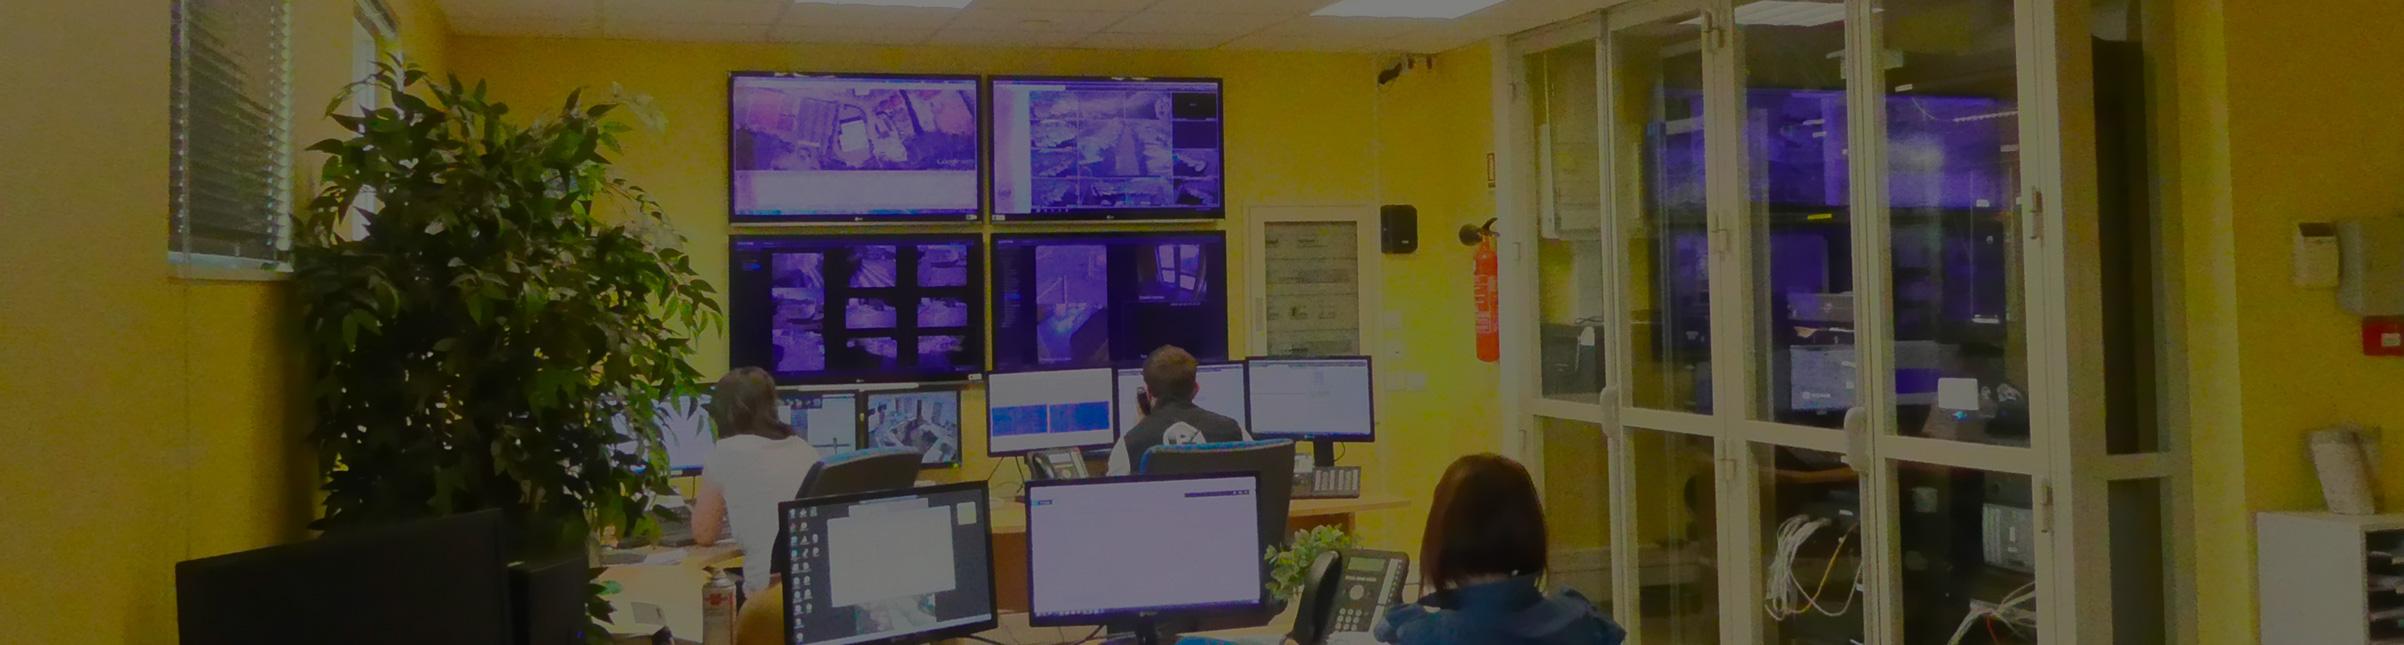 centre de telesurveillance